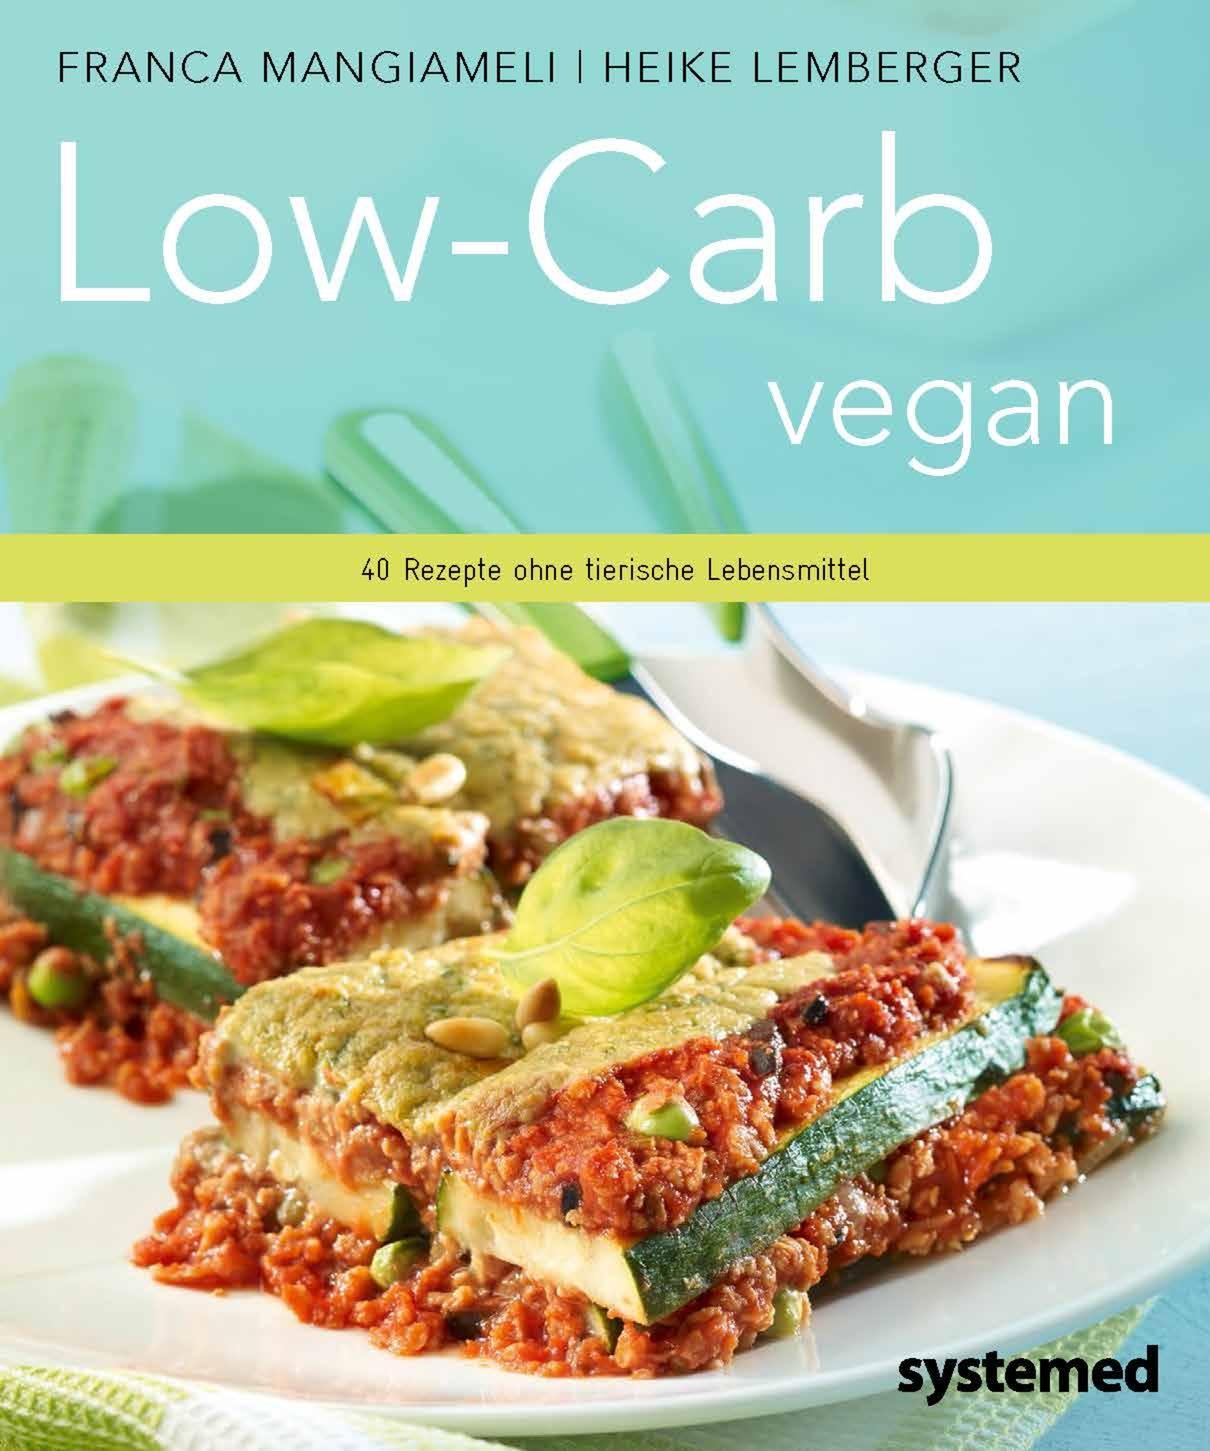 Low-Carb vegan: 40 Rezepte ohne tierische Lebensmittel - Franca Mangiameli